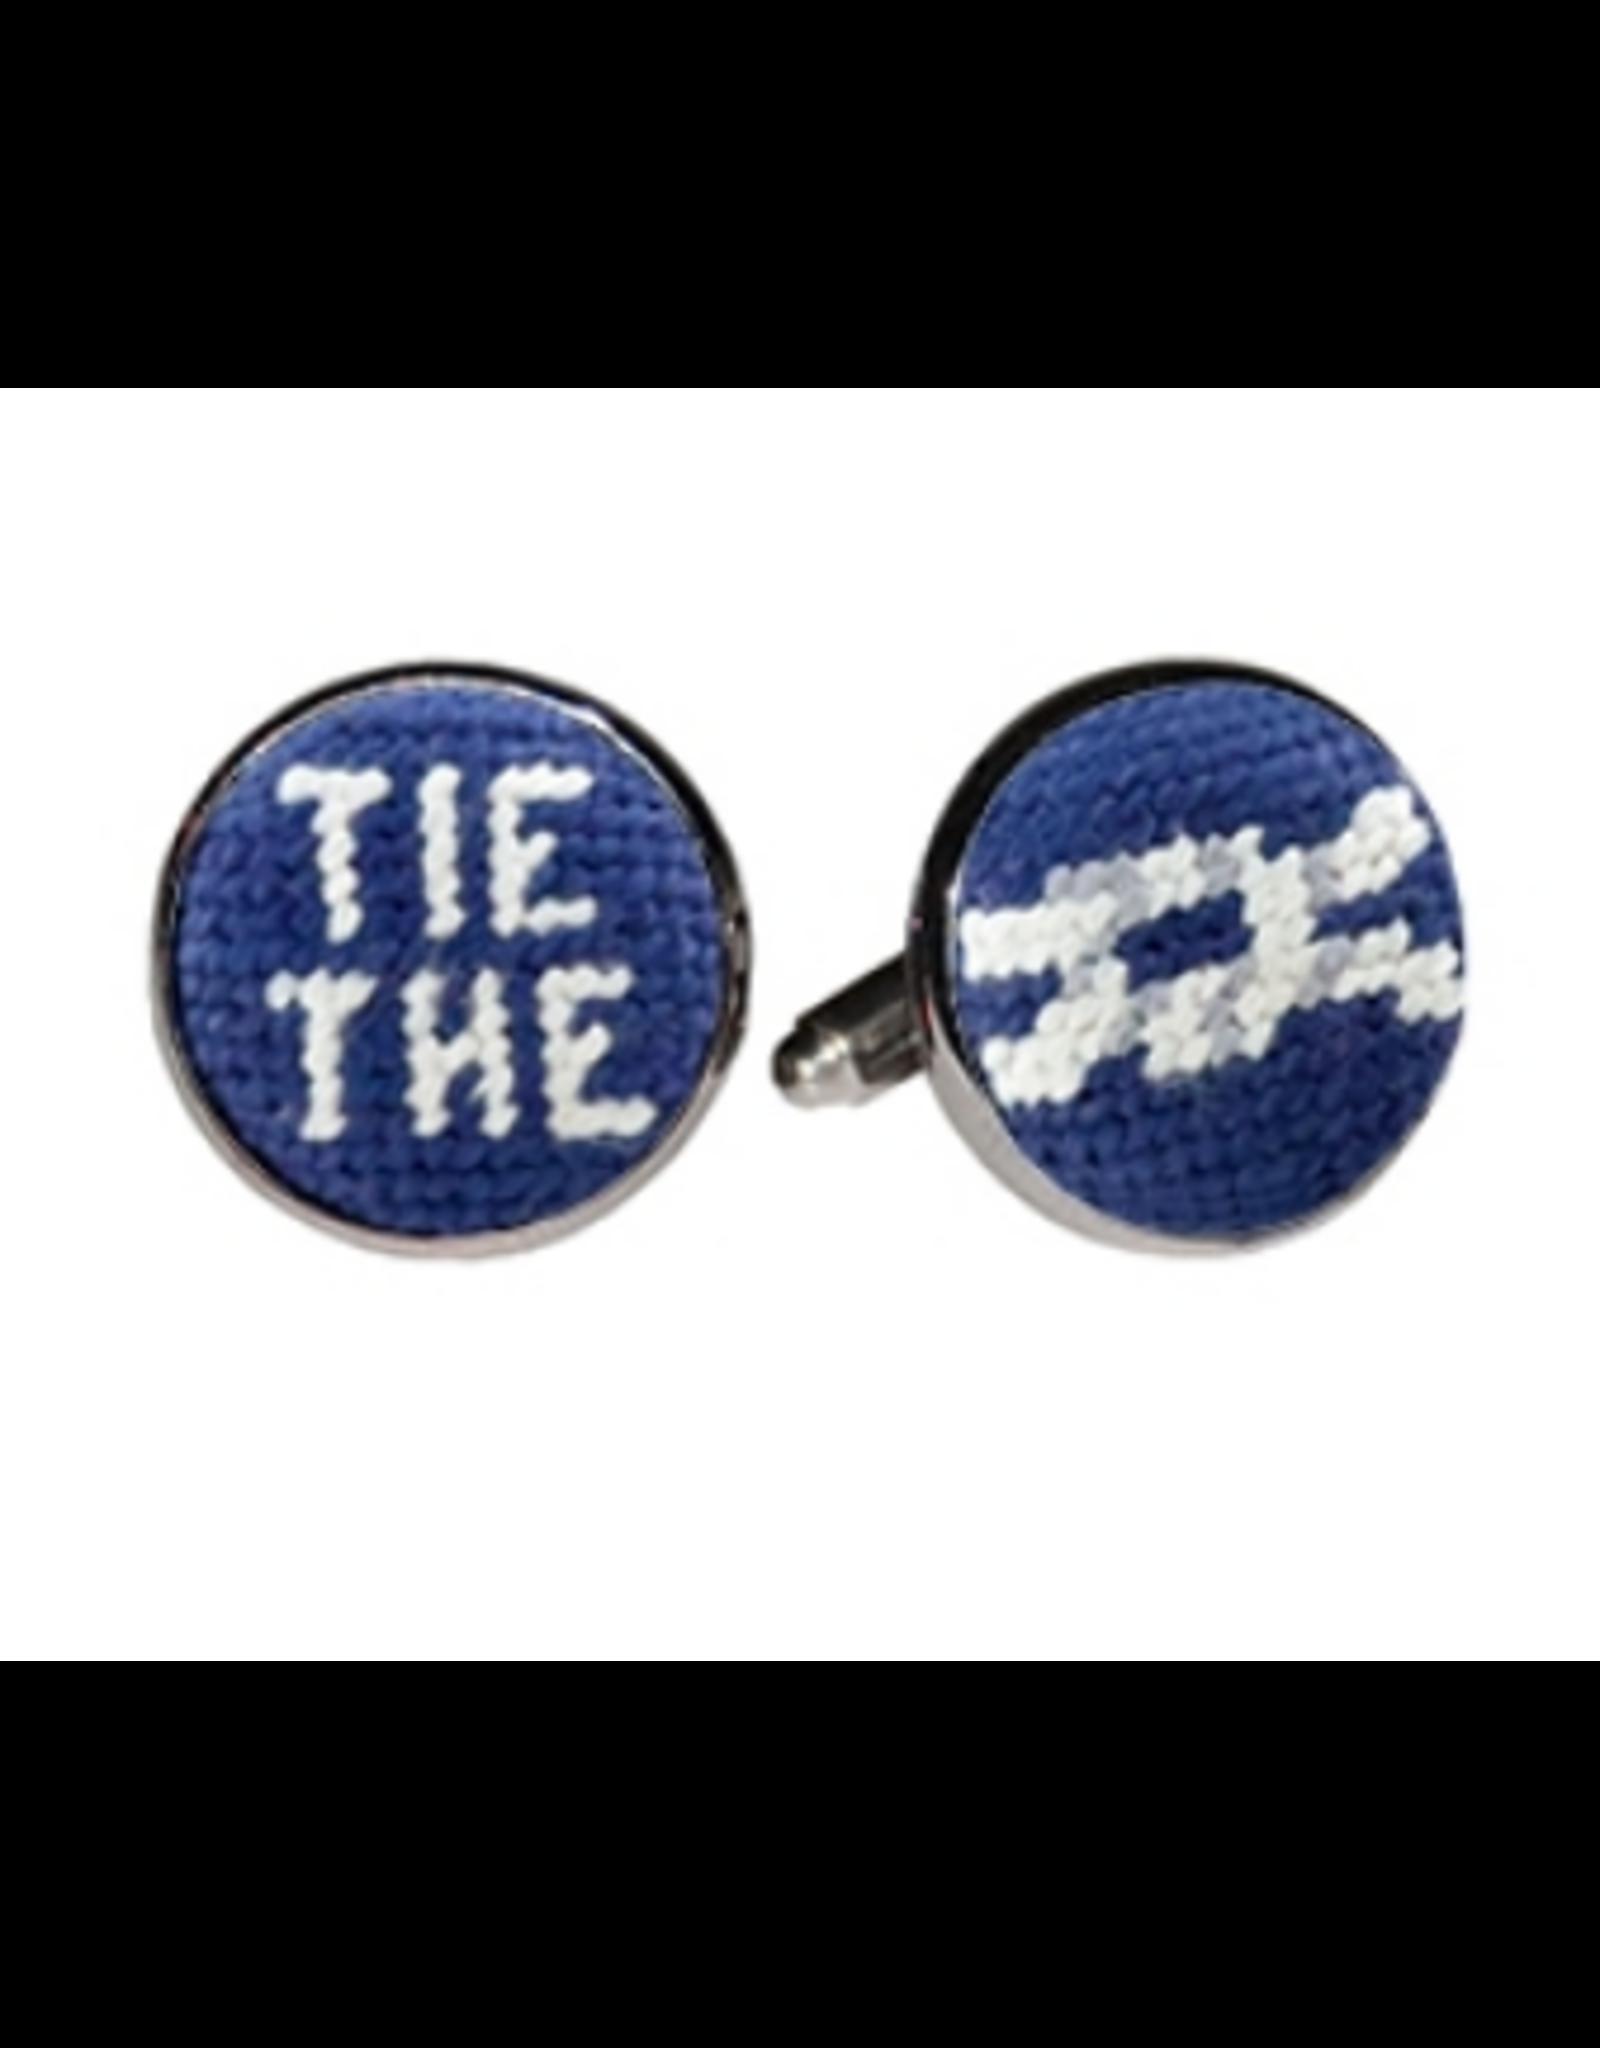 Smathers & Branson Tie The Knot Cufflinks